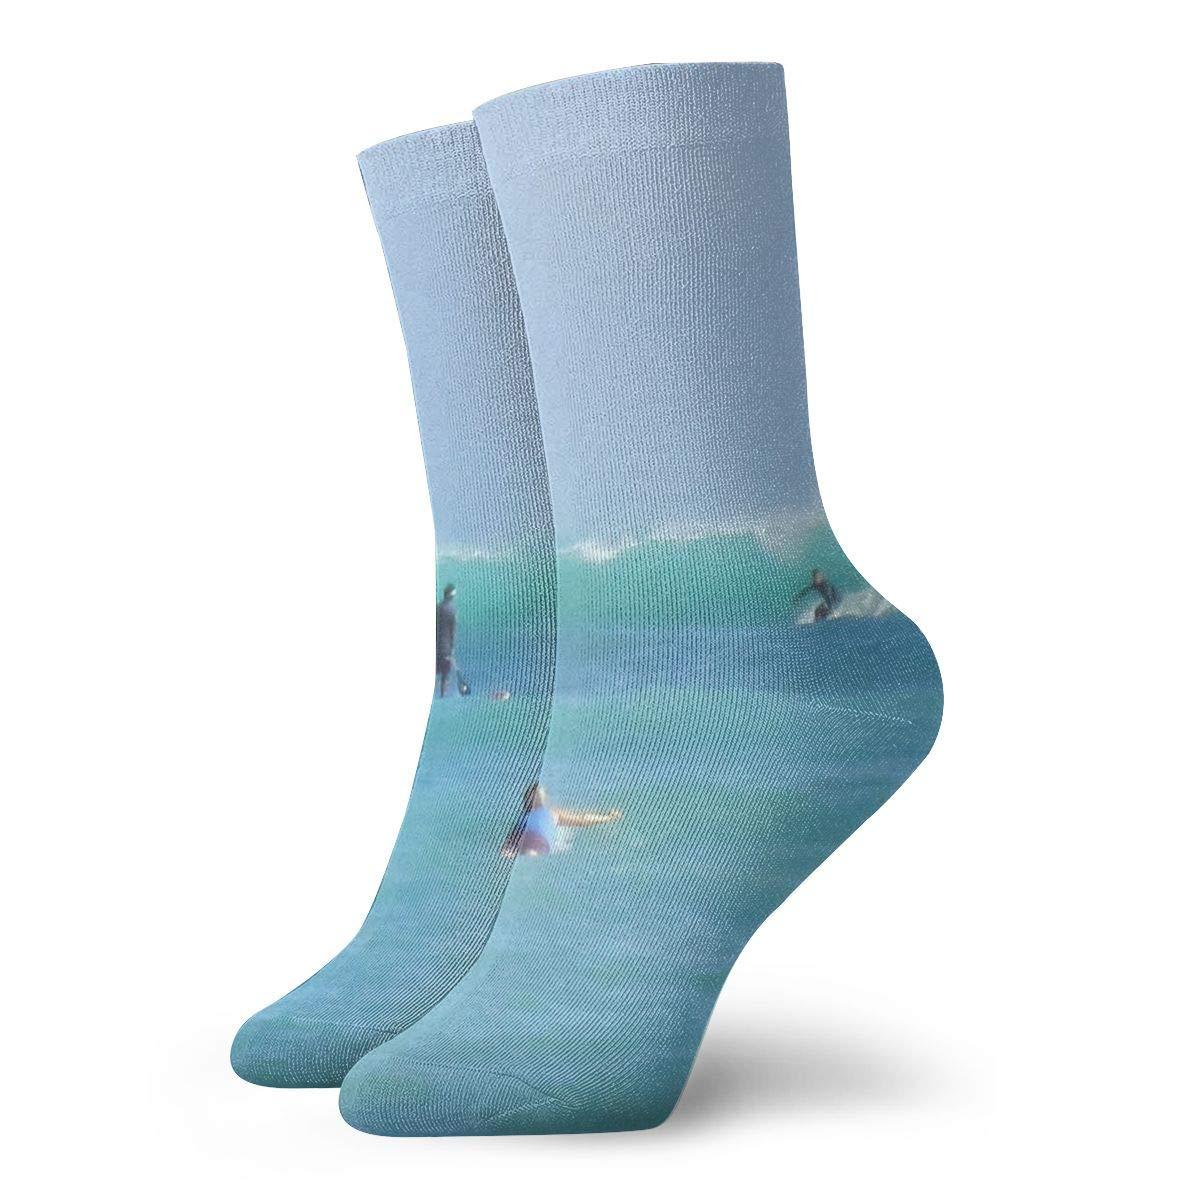 WEEDKEYCAT Hawaii Summer Beach Surfing Adult Short Socks Cotton Fun Socks for Mens Womens Yoga Hiking Cycling Running Soccer Sports